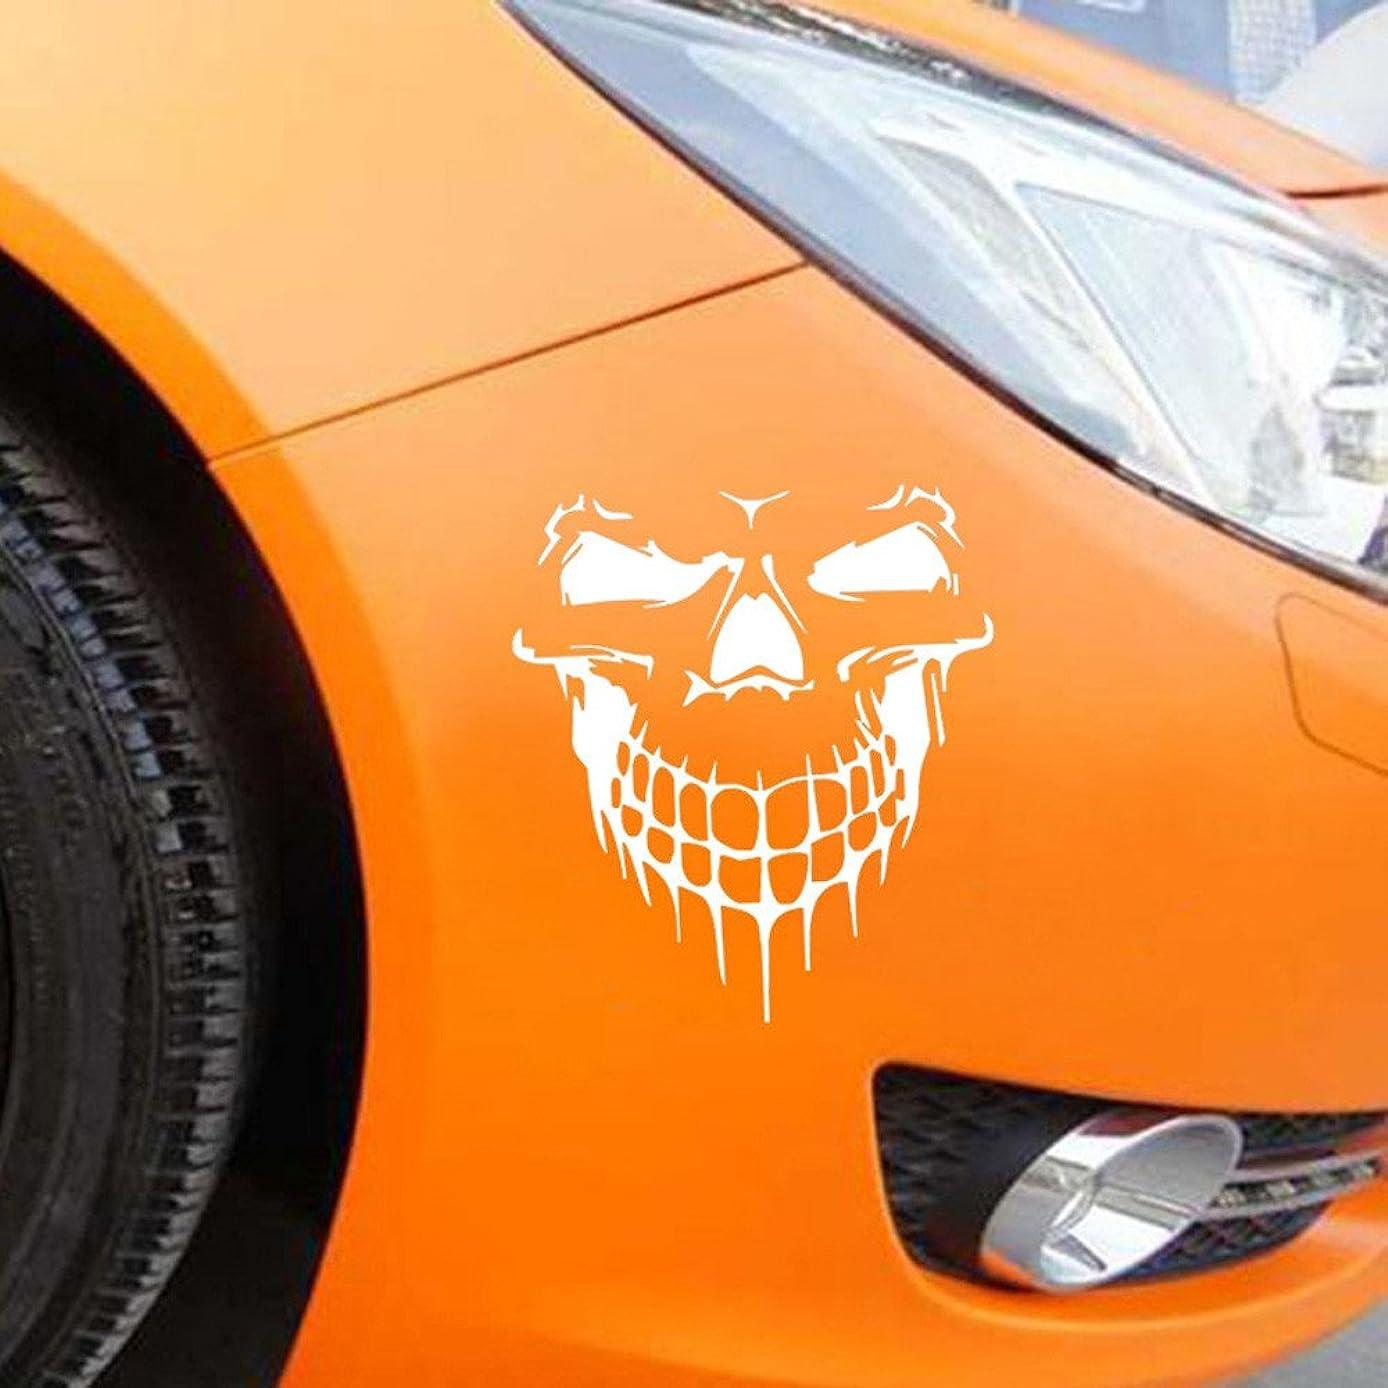 Veepola Reflective Skull Car Stickers Styling Removable Waterproof Sticker Decoration